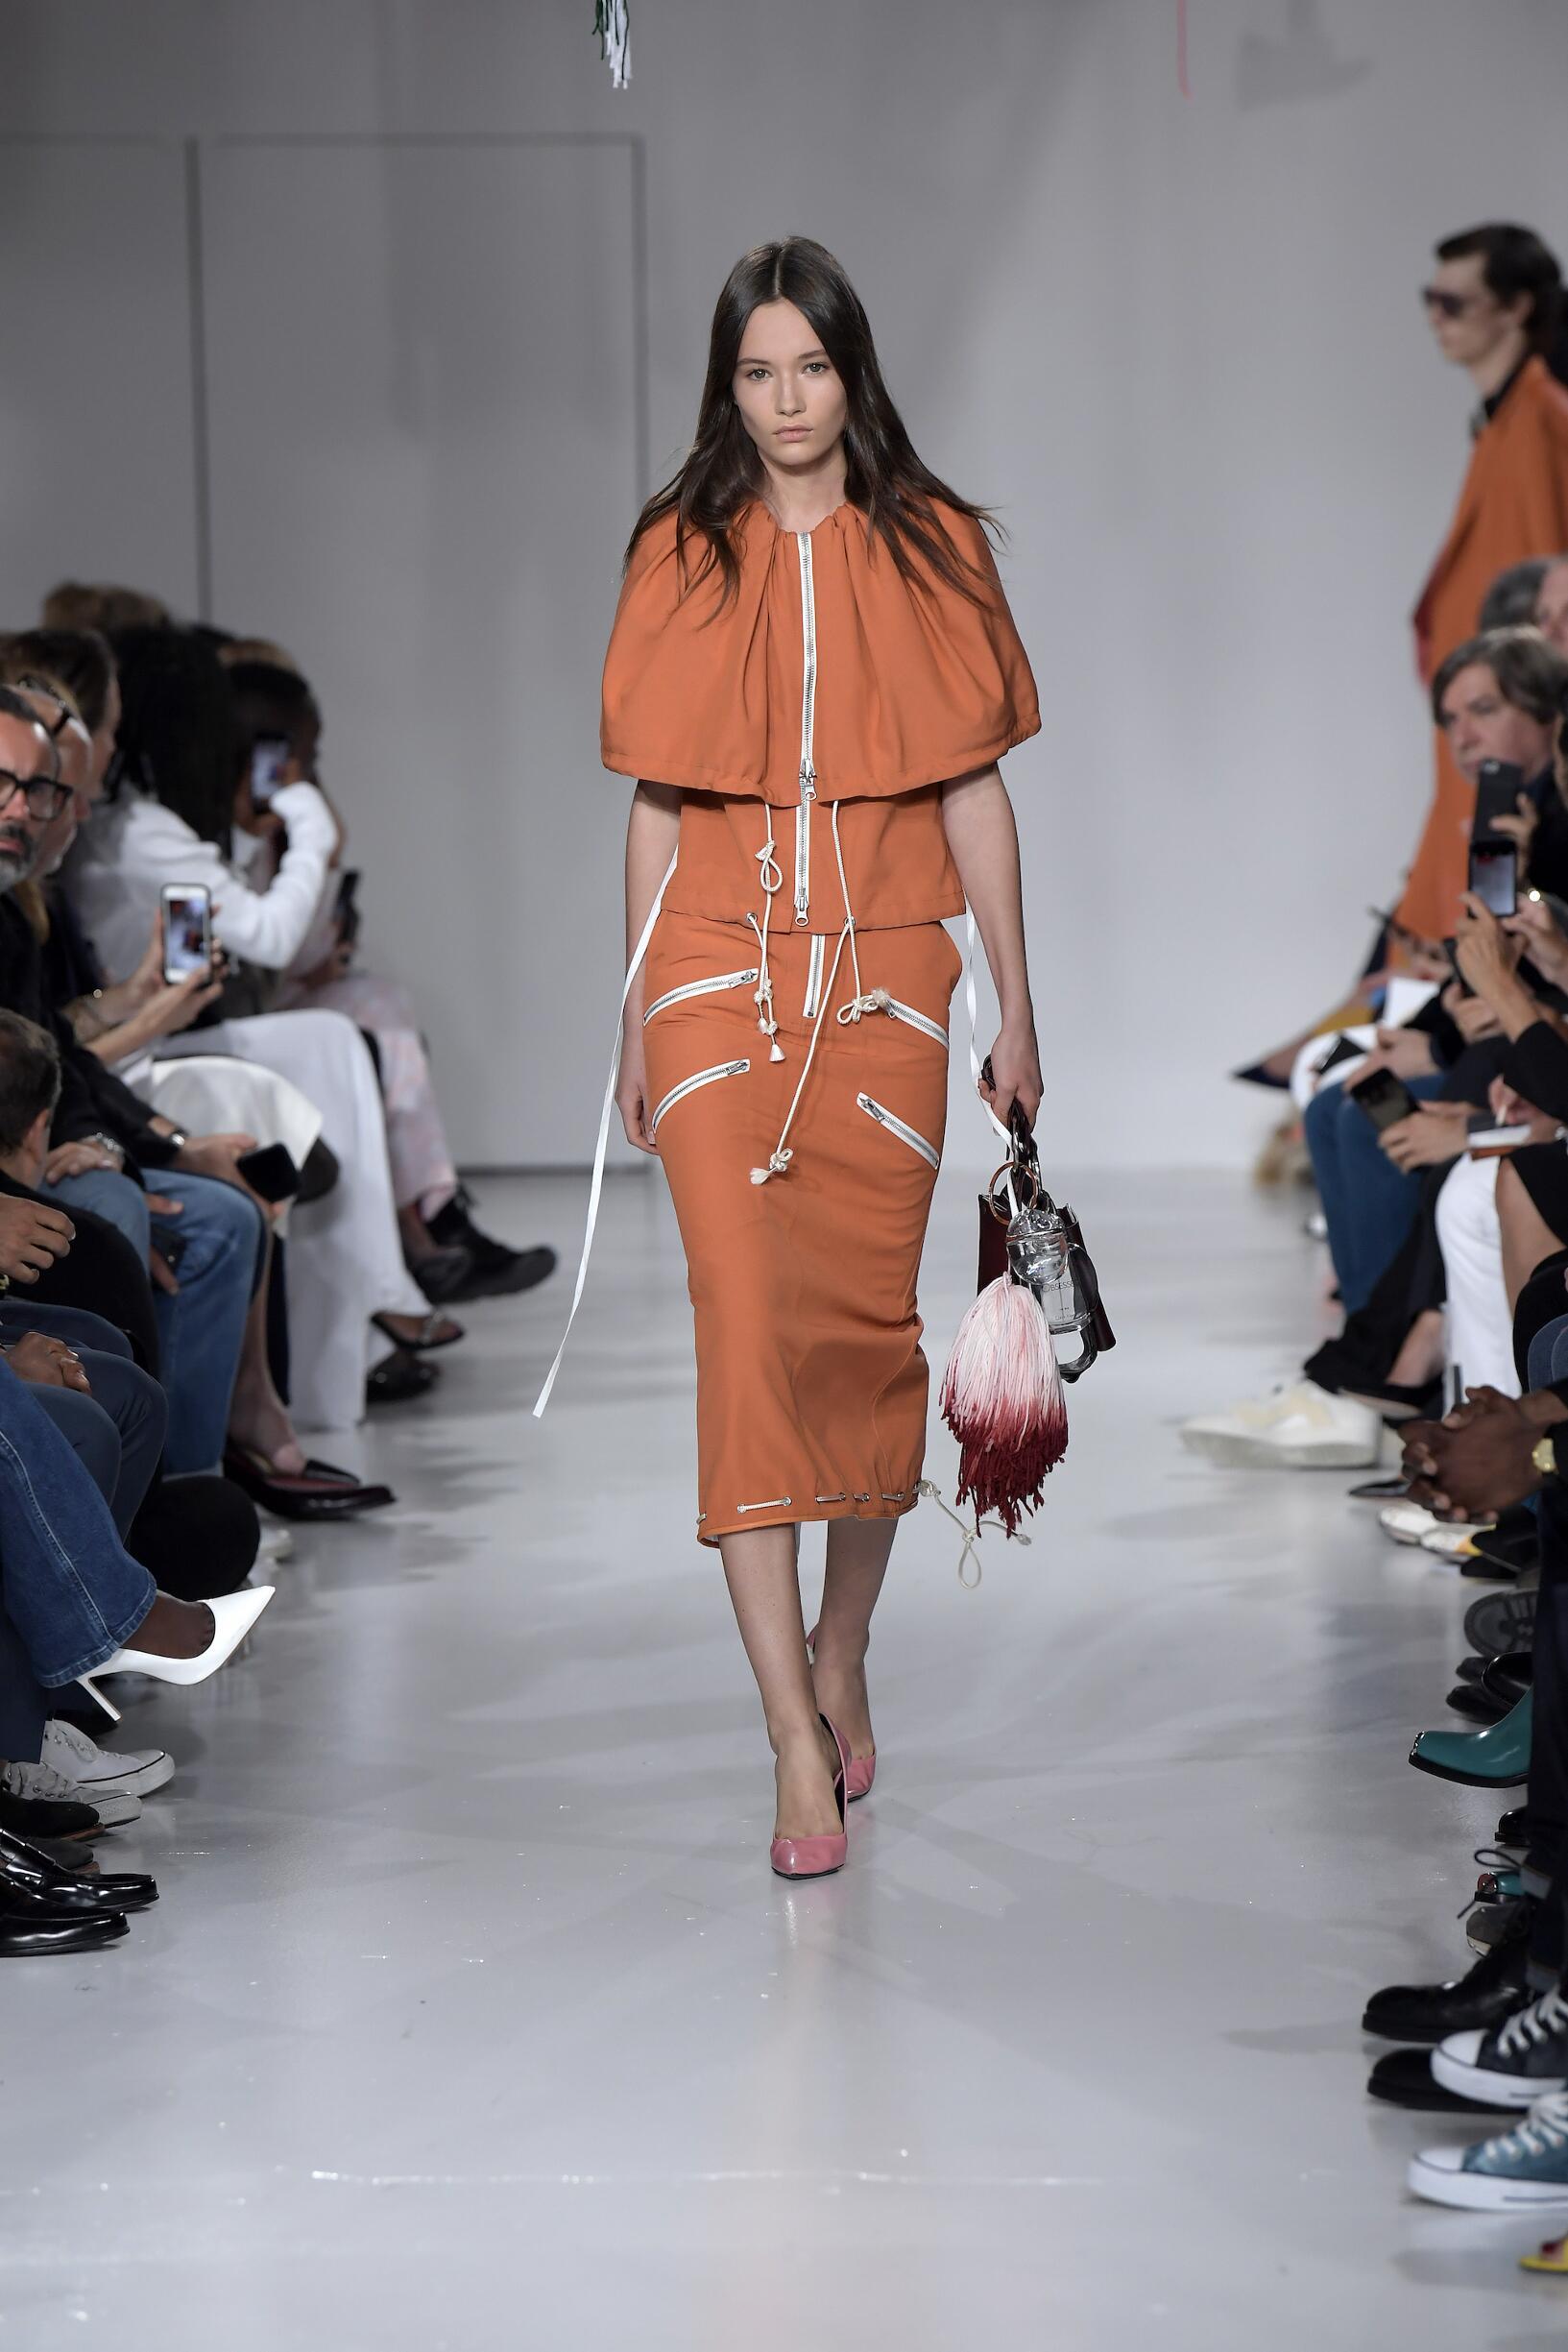 SS 2018 Calvin Klein 205W39NYC Fashion Show New York